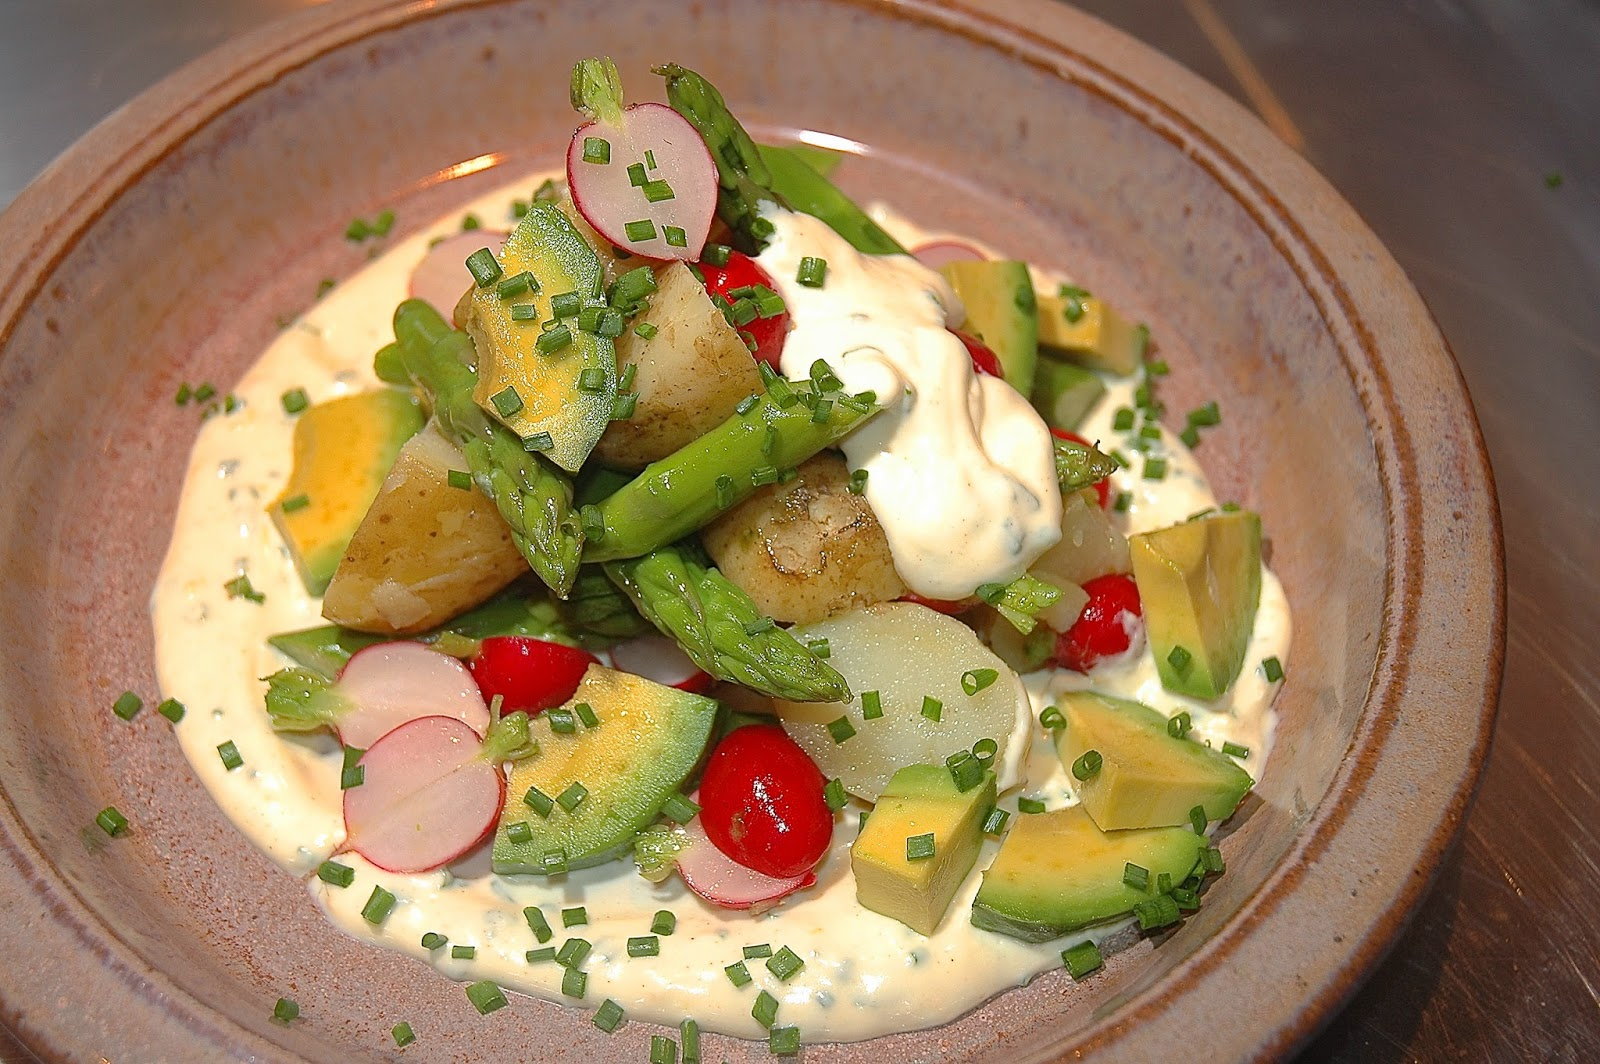 ... Jersey Royals, Radish, Asparagus & Avocado, Crème Fraîche & Chives